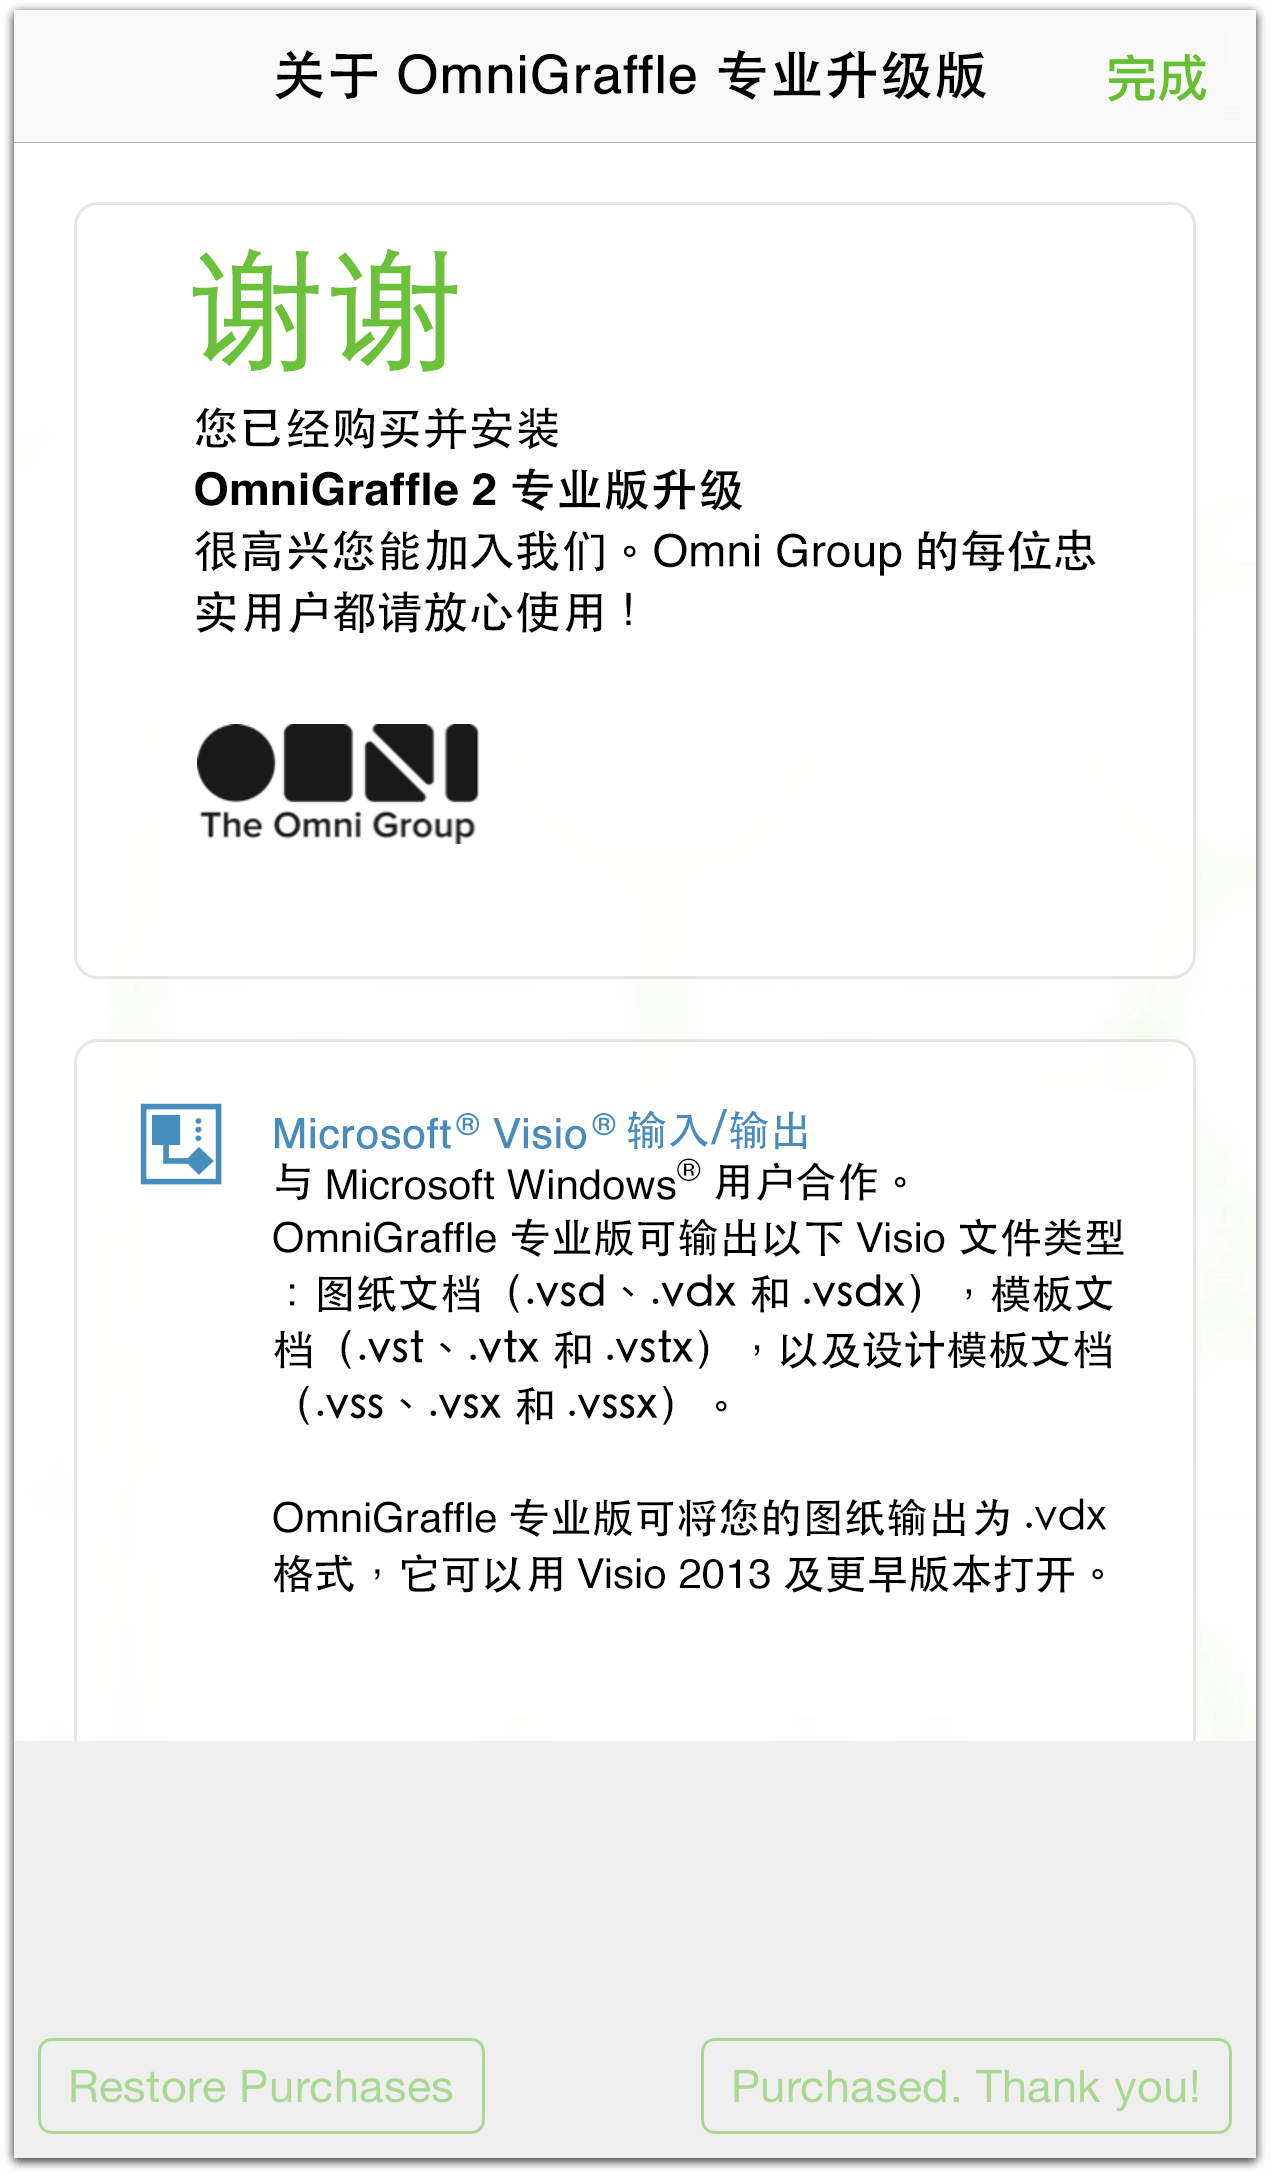 感谢您升级到 OmniGraffle 2 专业版